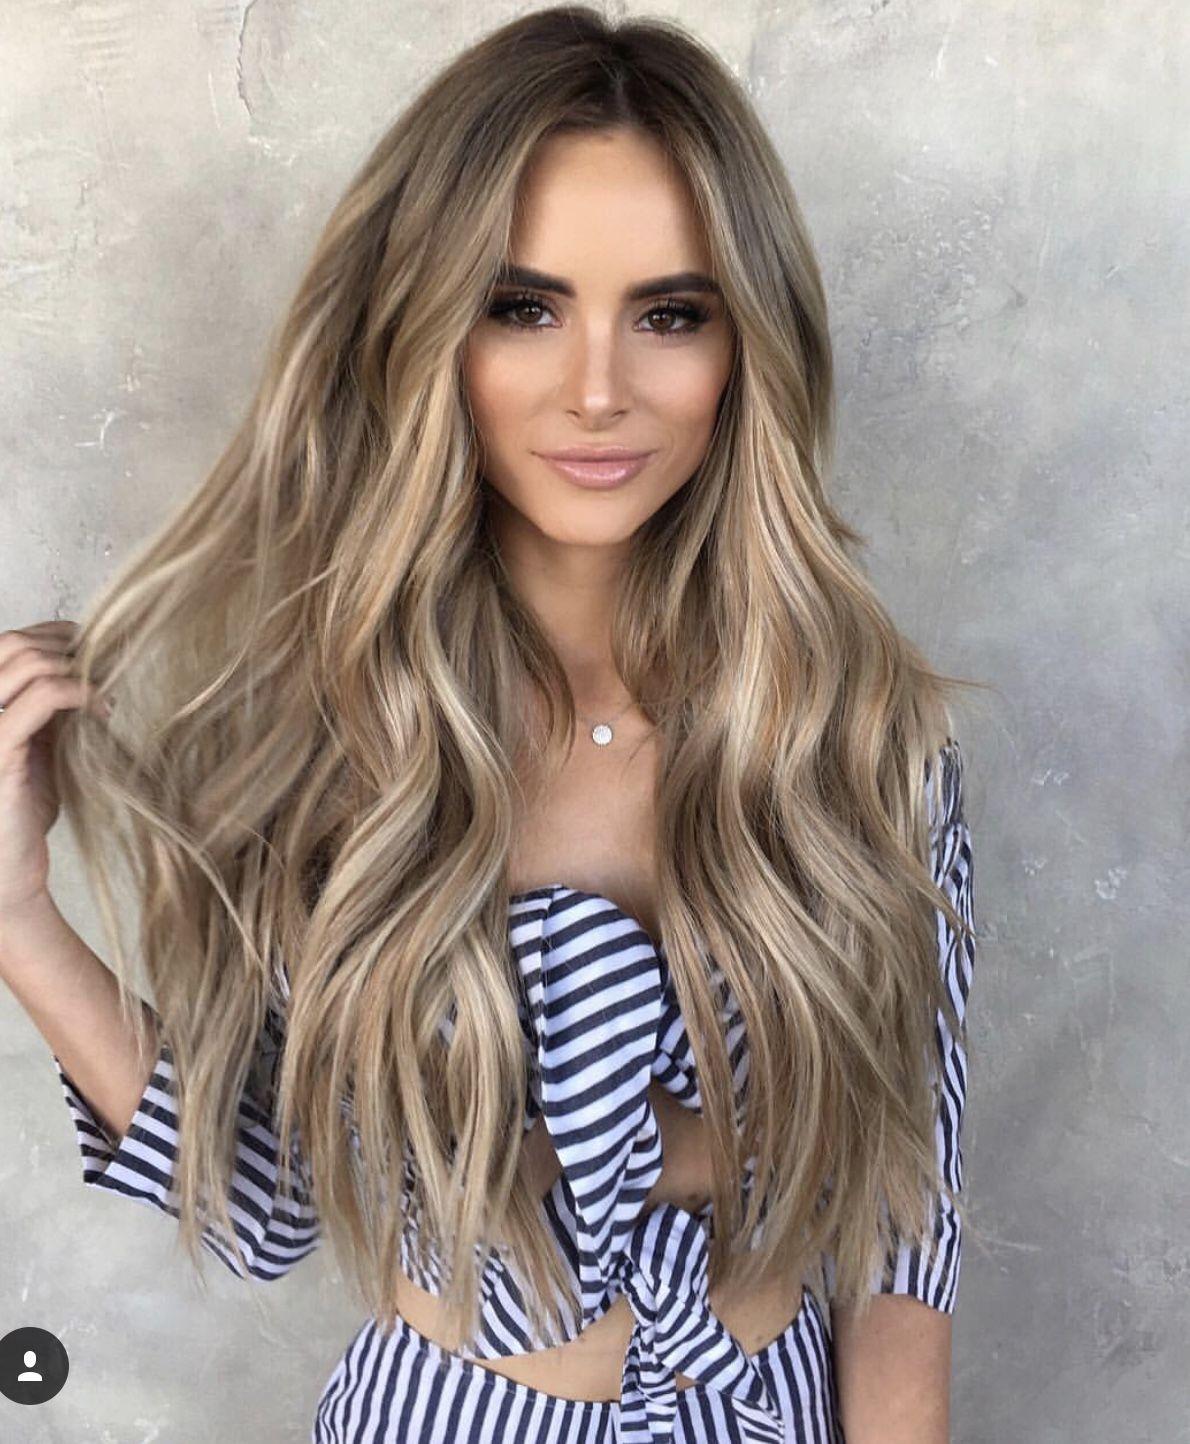 Hair Inspiration 2019-04-18 23:38:50